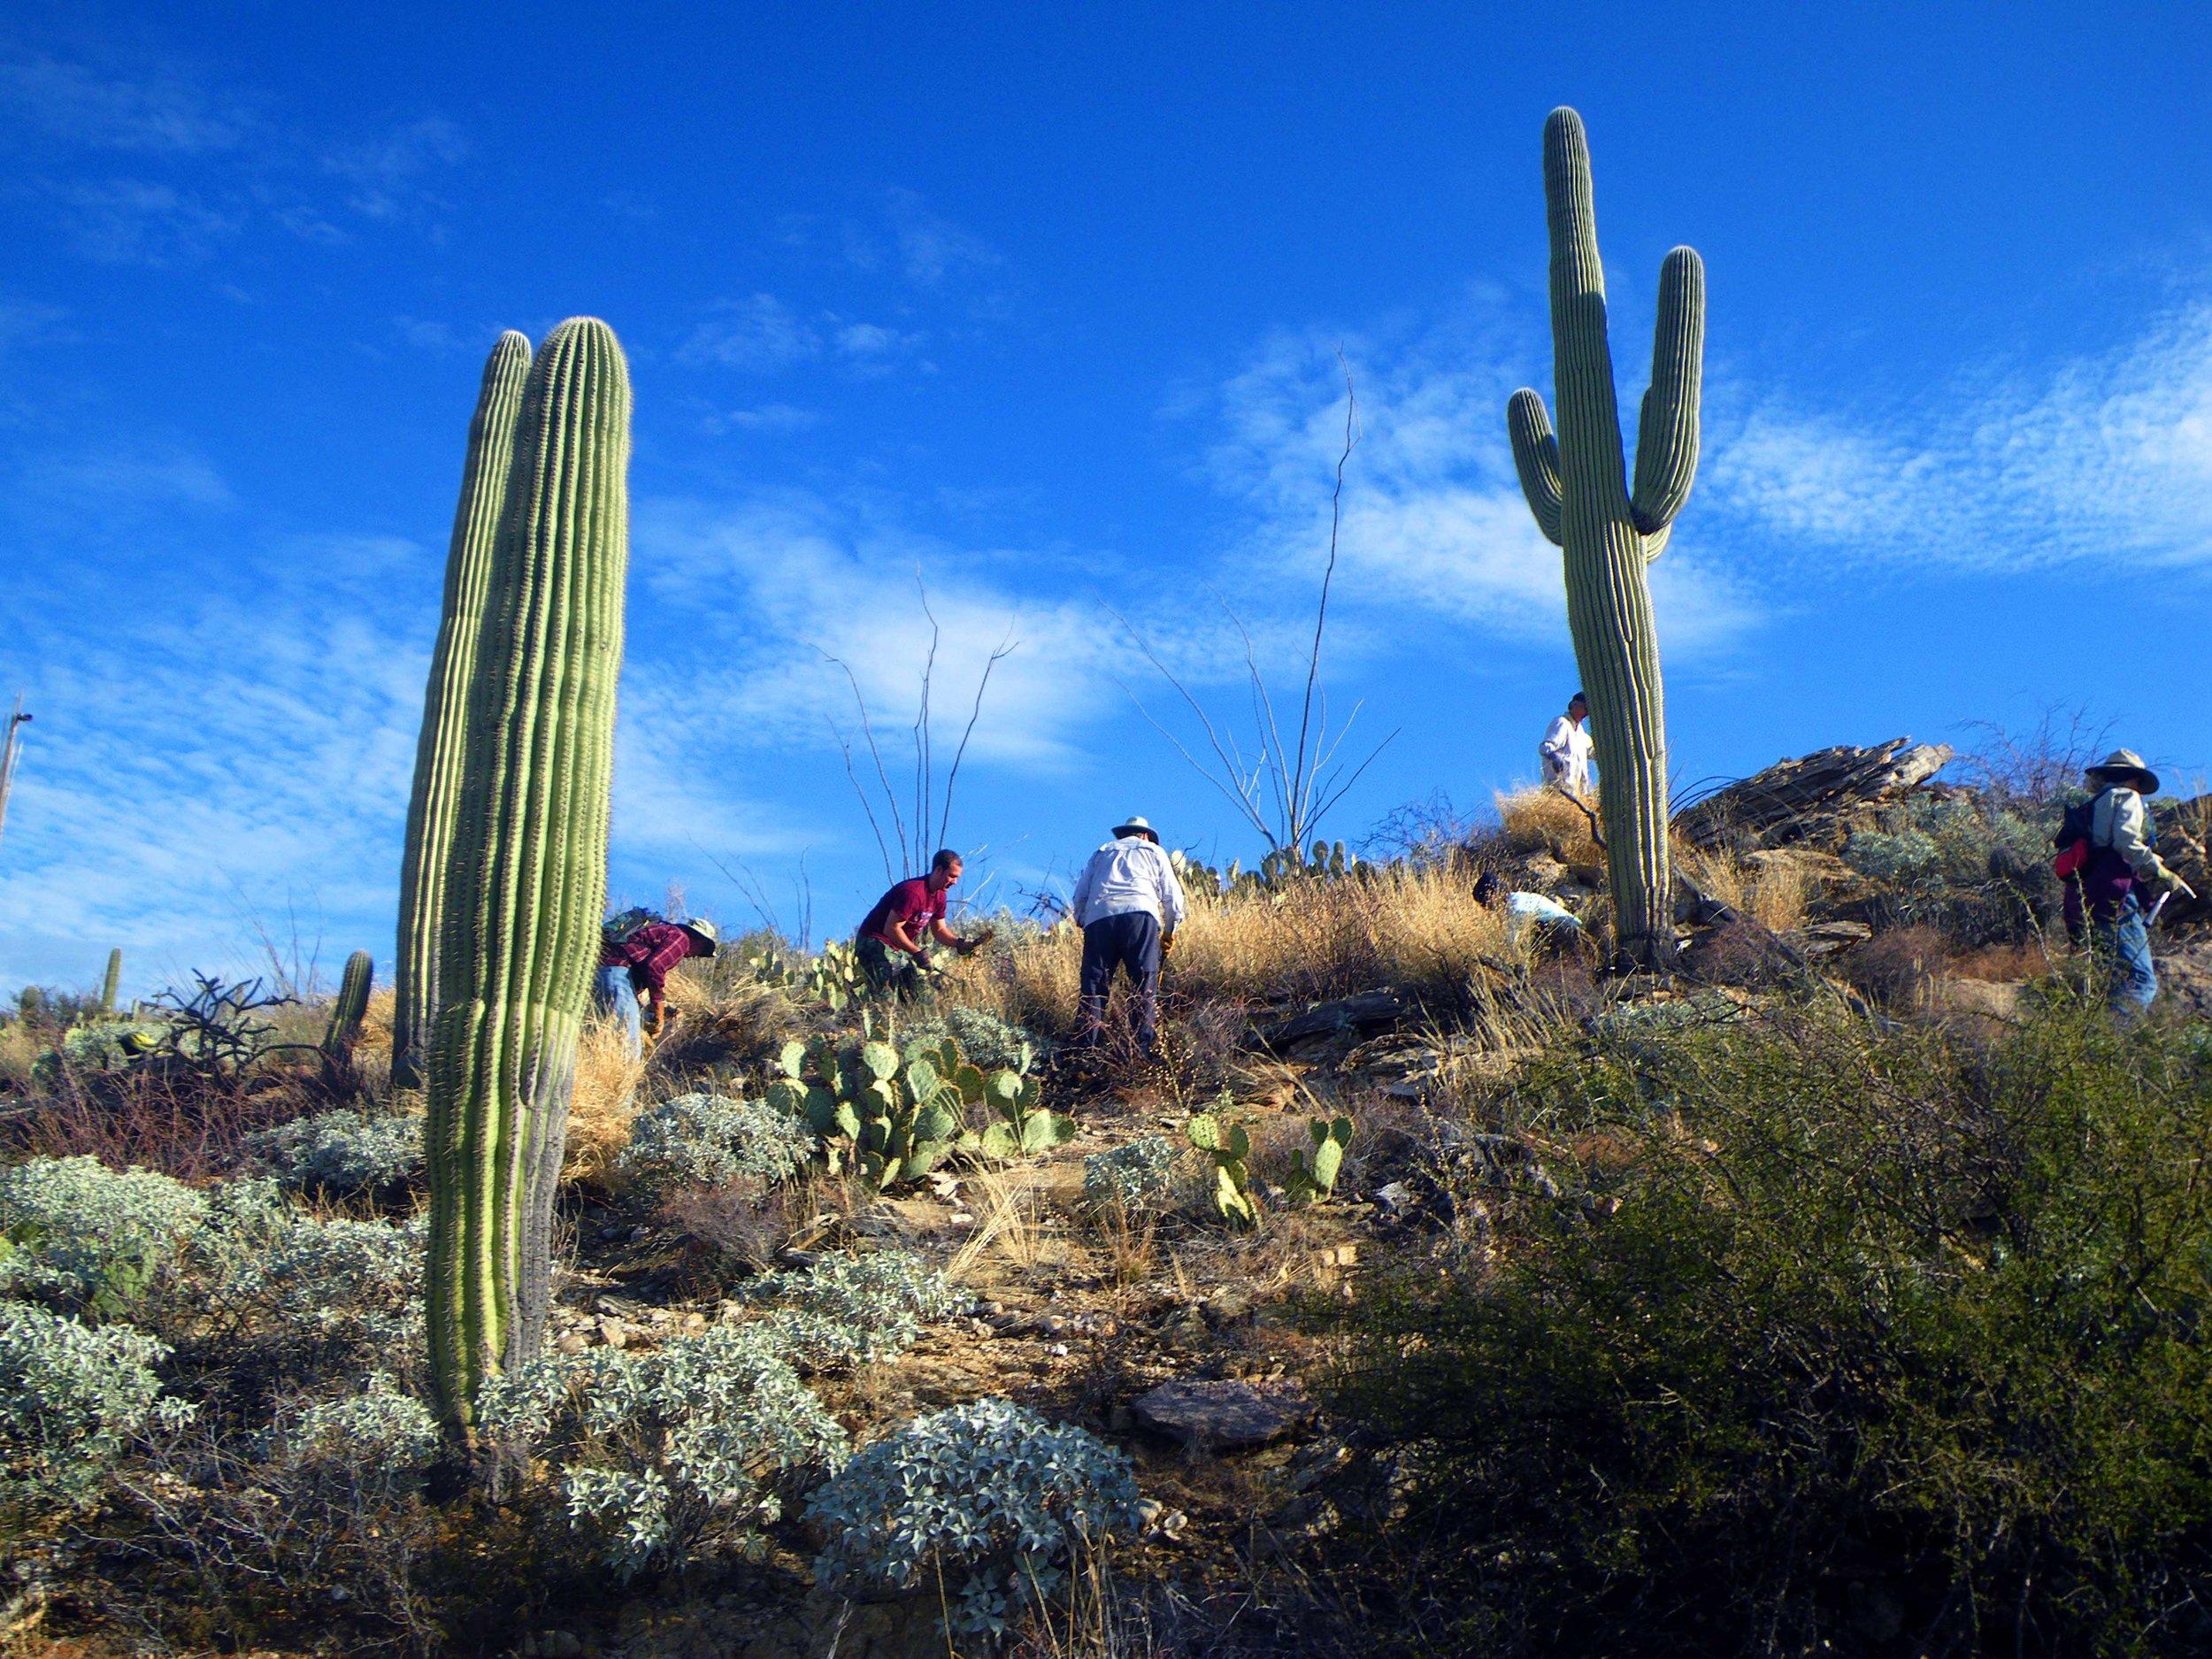 Volunteers at Saguaro N.P.